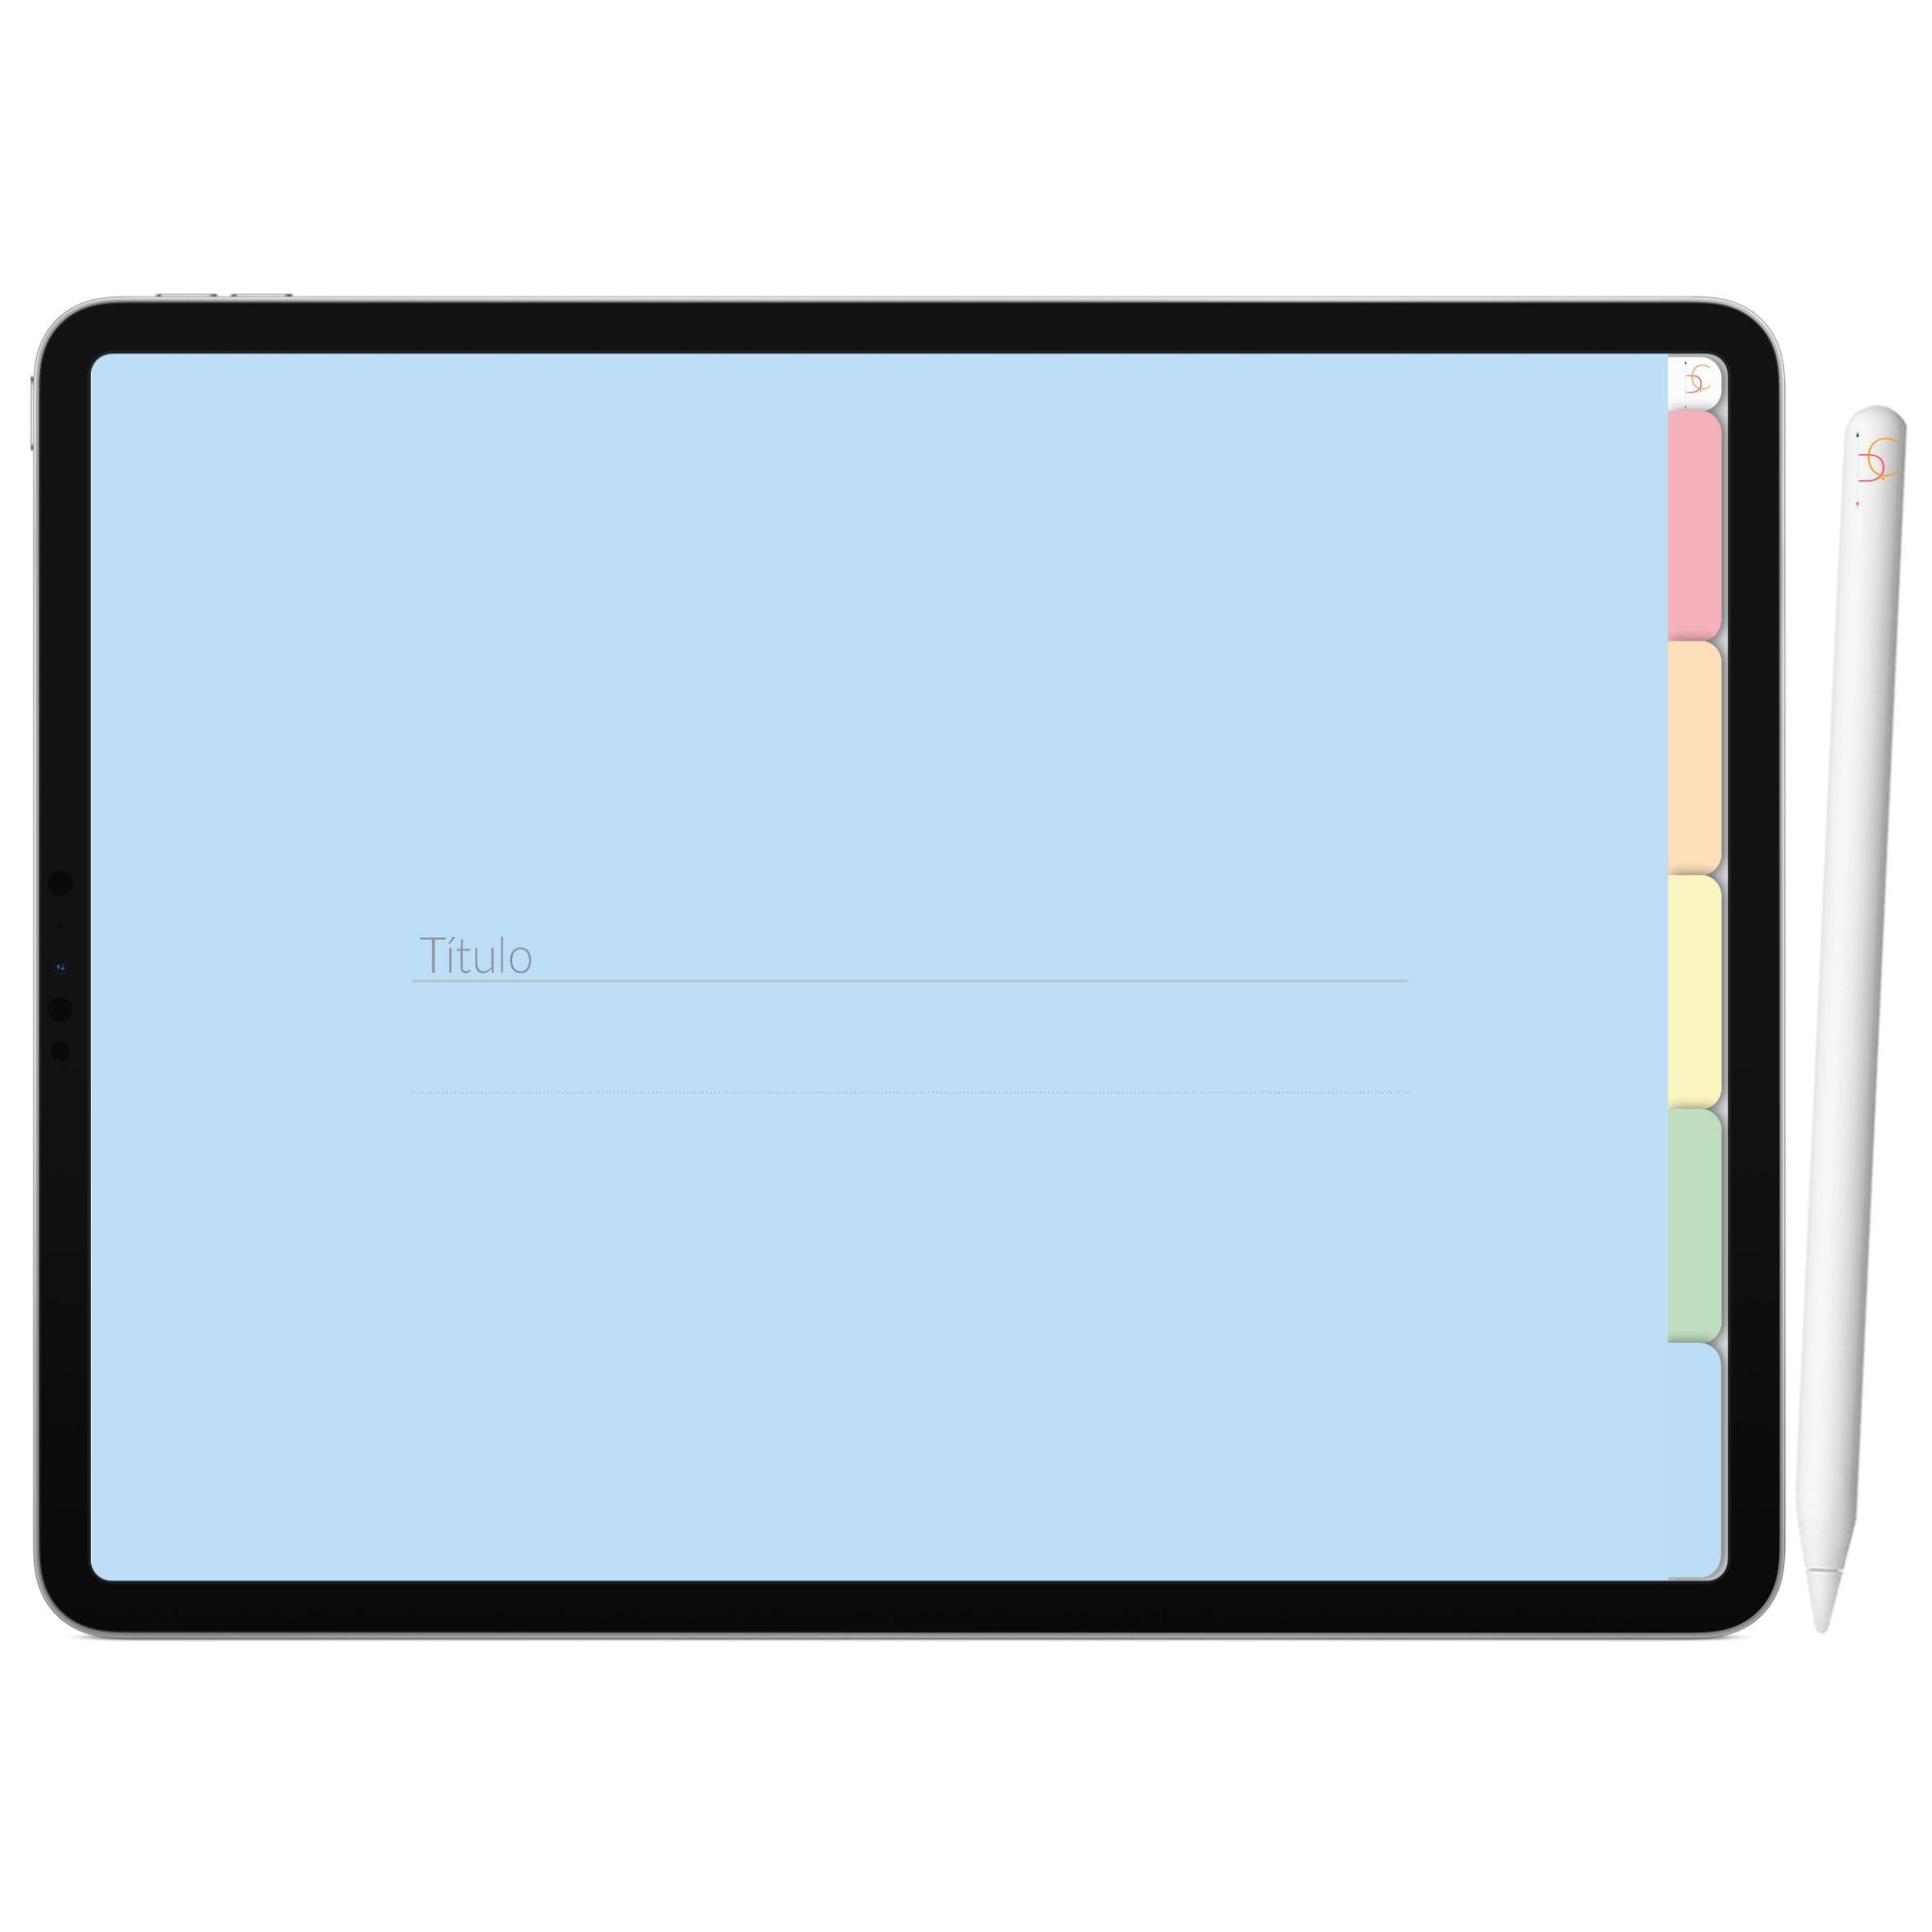 Mapa Mental Digital Verde Arco-Íris | Cinco Matérias Interativo| iPad Tablet | Download Instantâneo